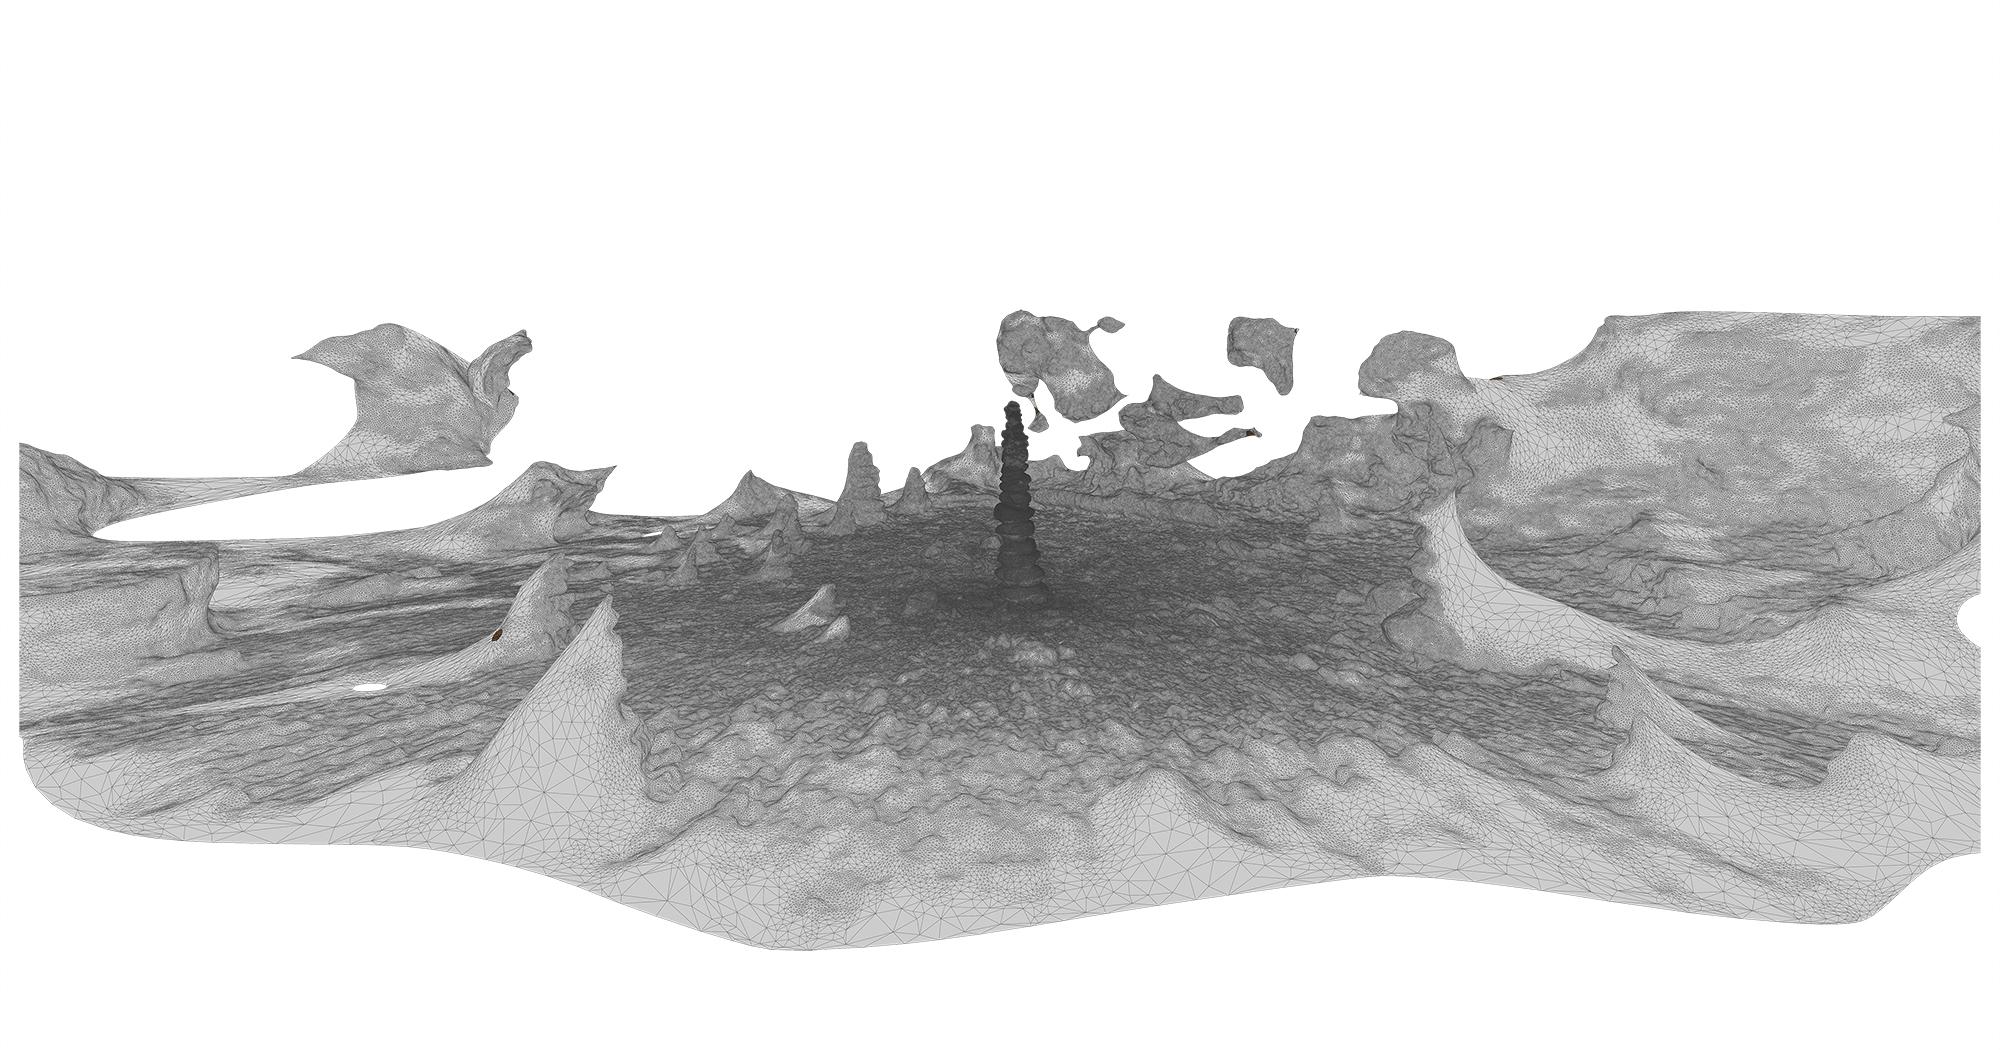 stone9_mesh 2 (21X40cm 300dpi)